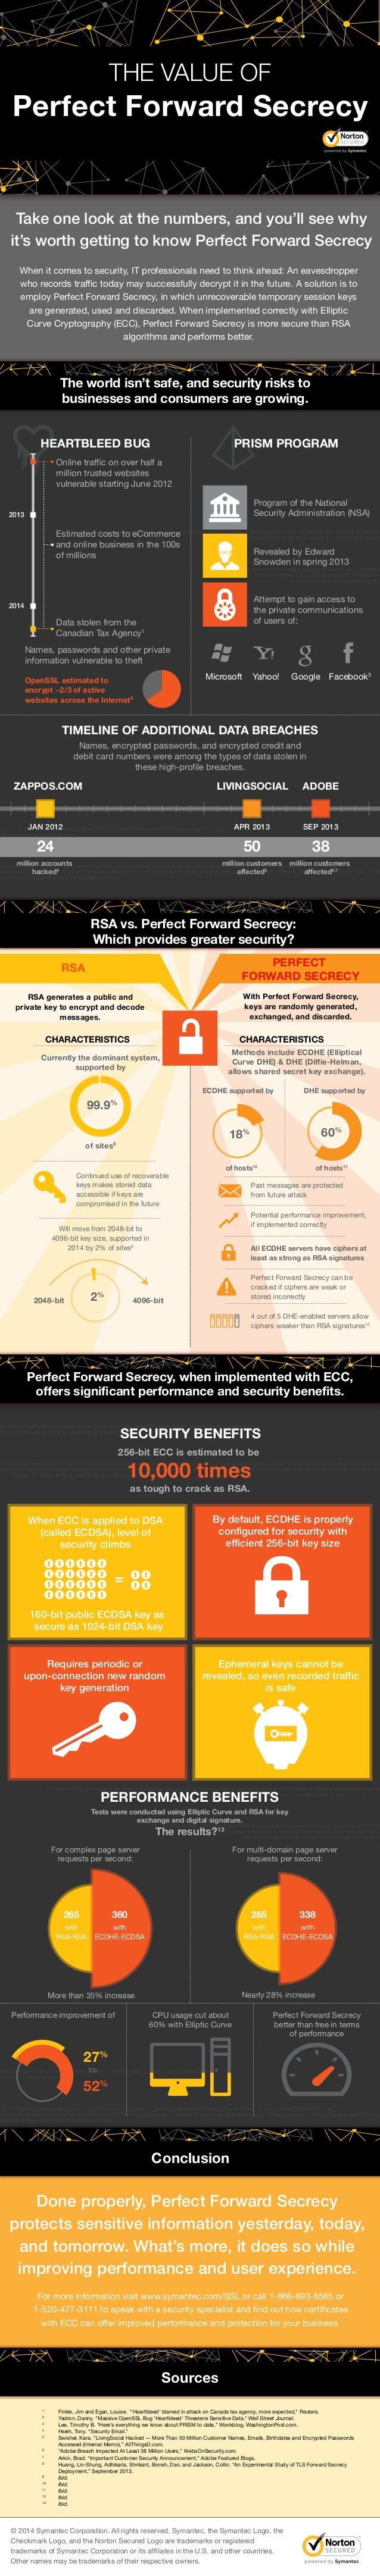 Symantec™ Perfect Forward Secrecy in Info-Graphic by RapidSSLOnline via slideshare